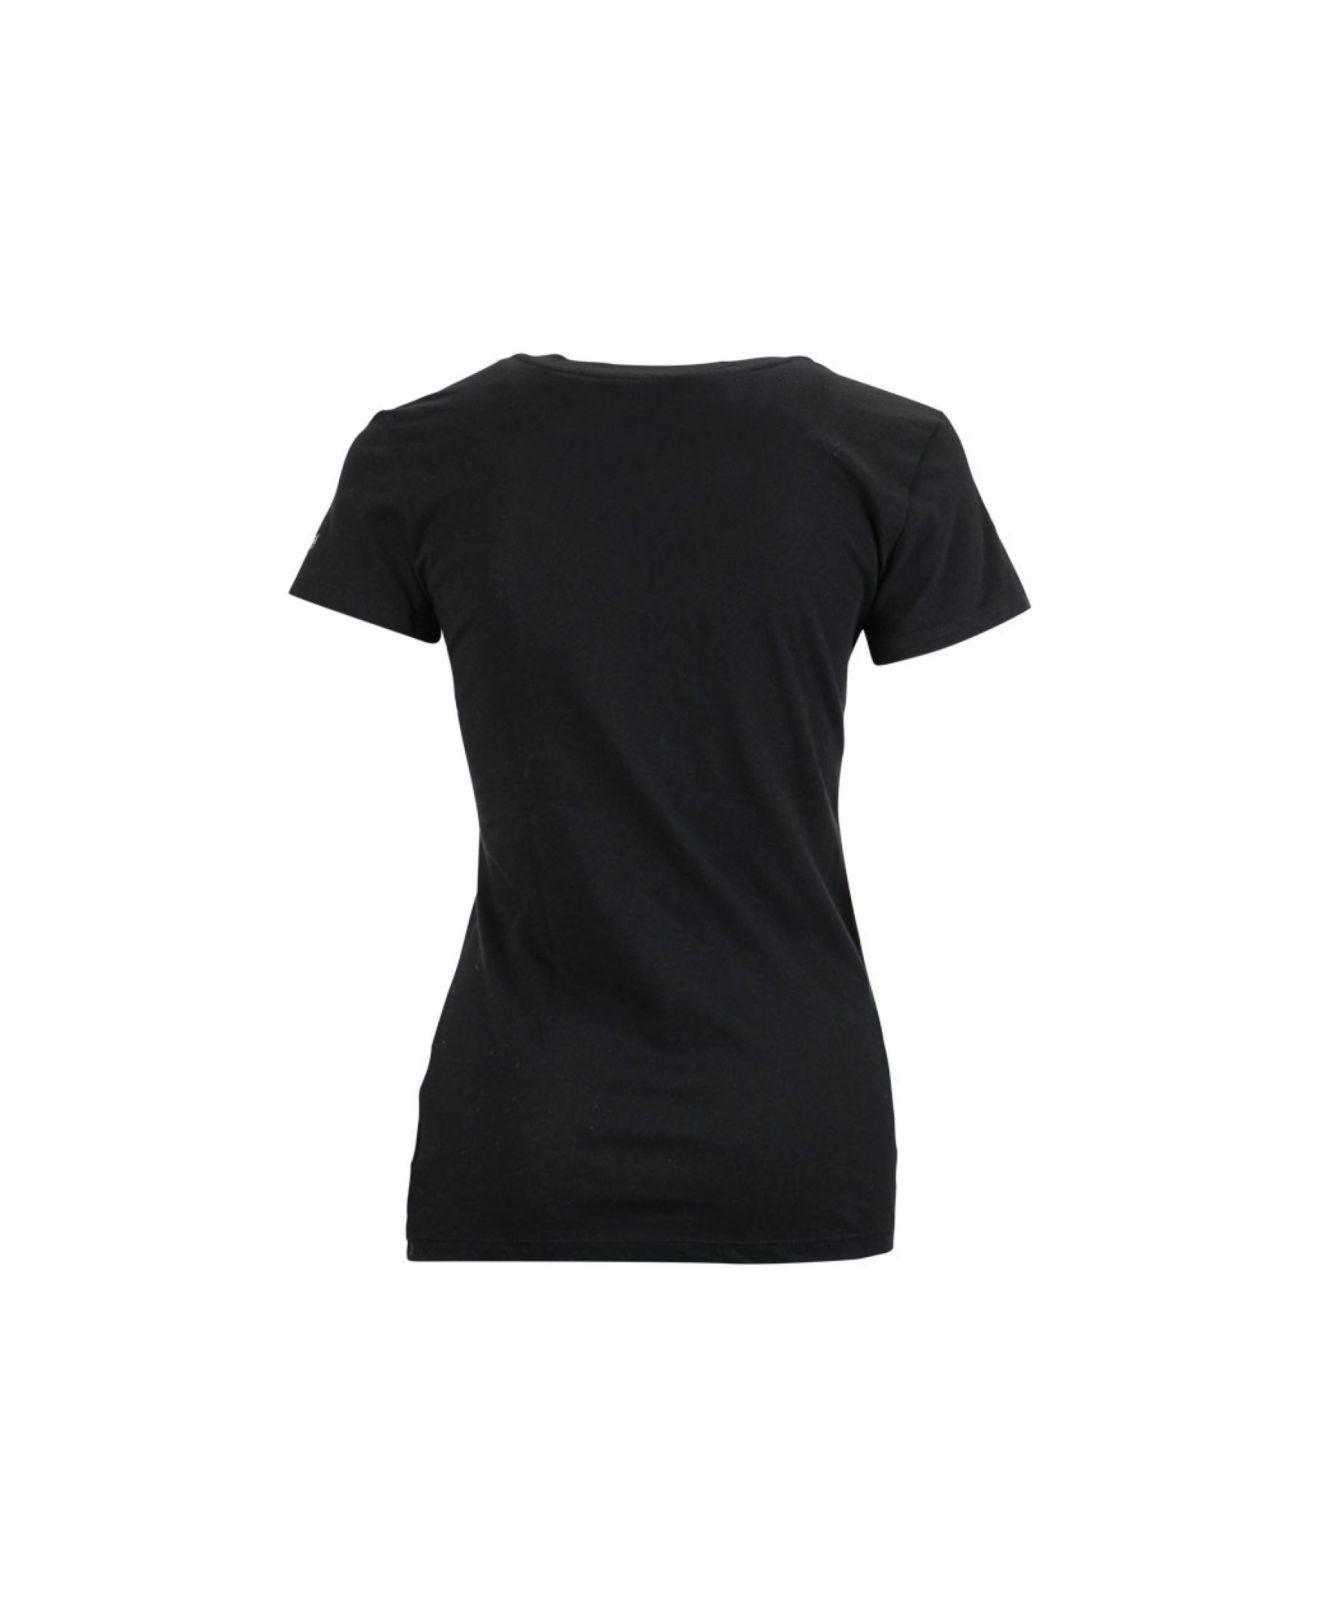 Lyst soffe women 39 s iowa hawkeyes v neck t shirt in black for Womens black v neck t shirt